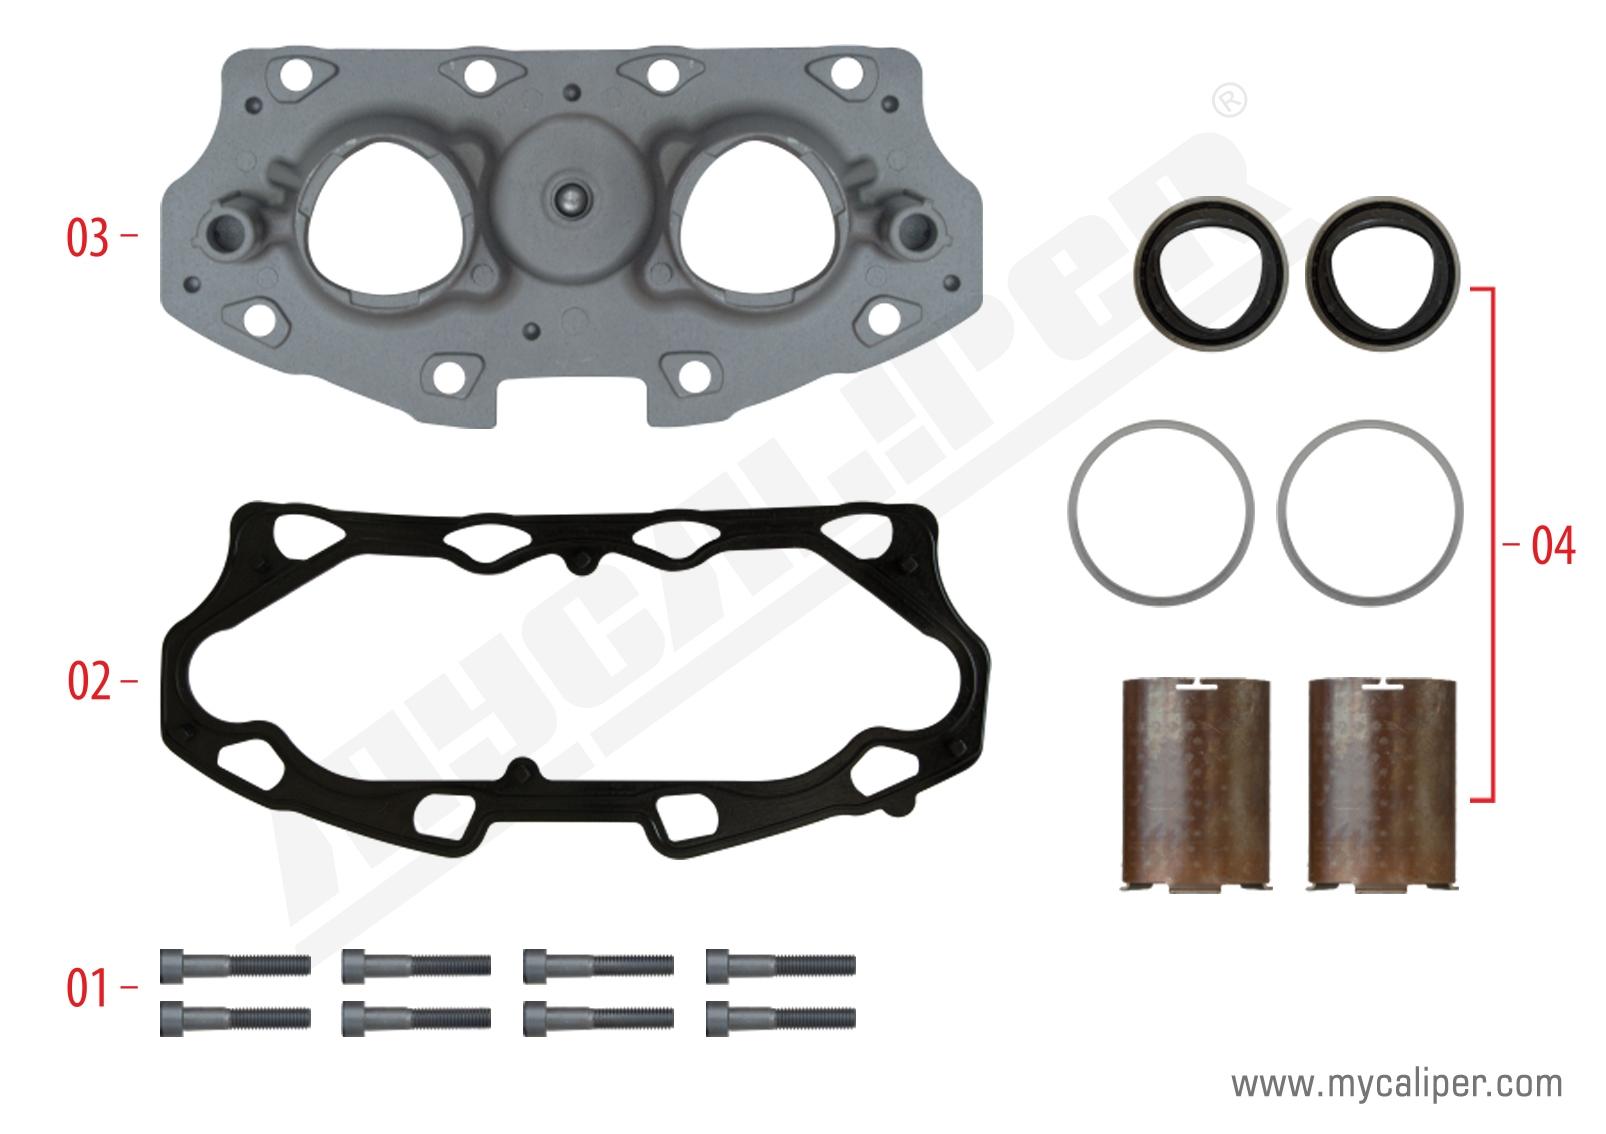 Caliper Calibration Mechanism Cover (Aluminium)